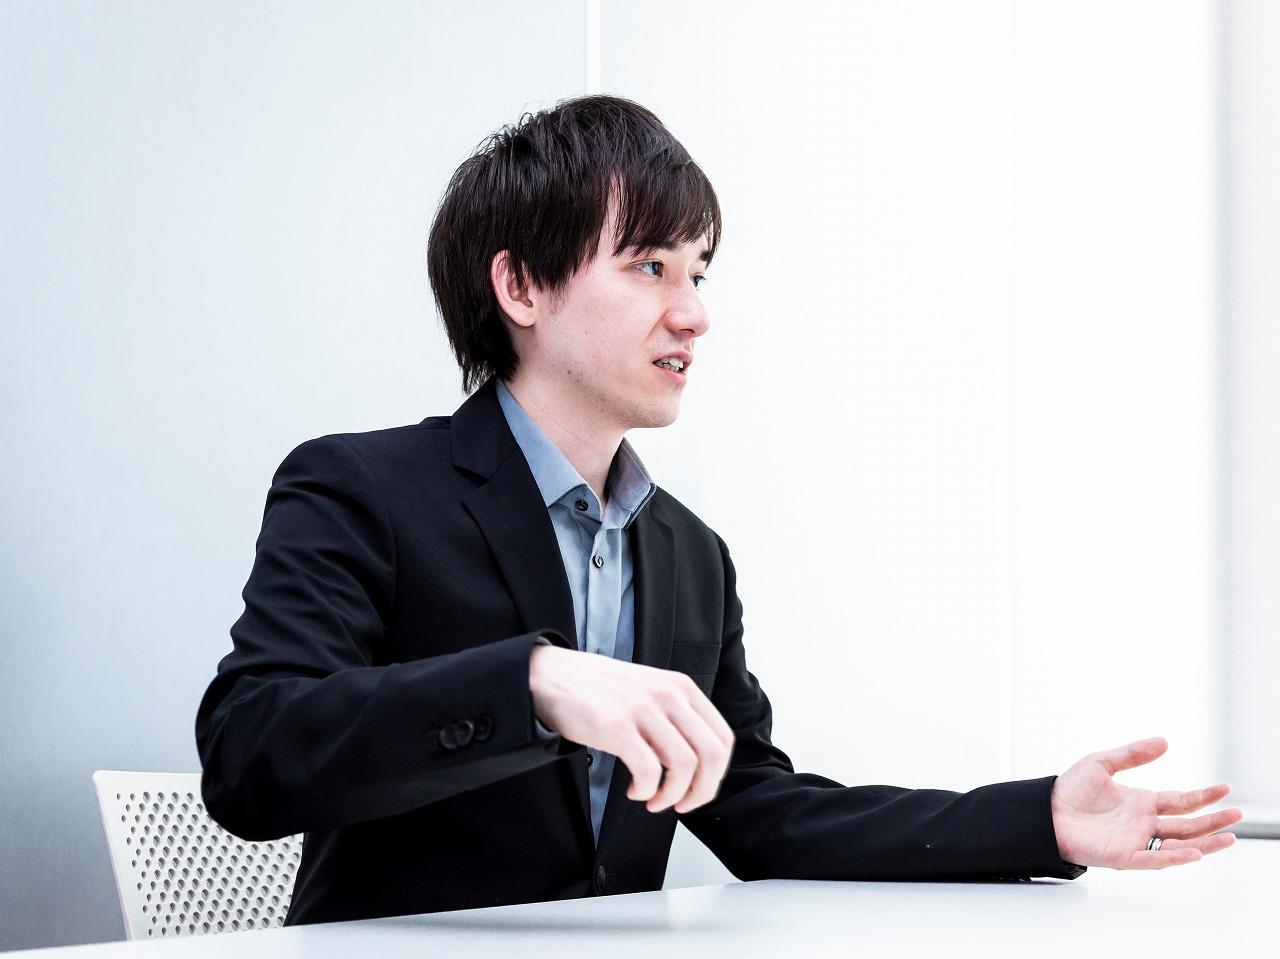 Boston Career Forum ONLINE 2020's Corporate Profile | CFN (CareerForum.Net)